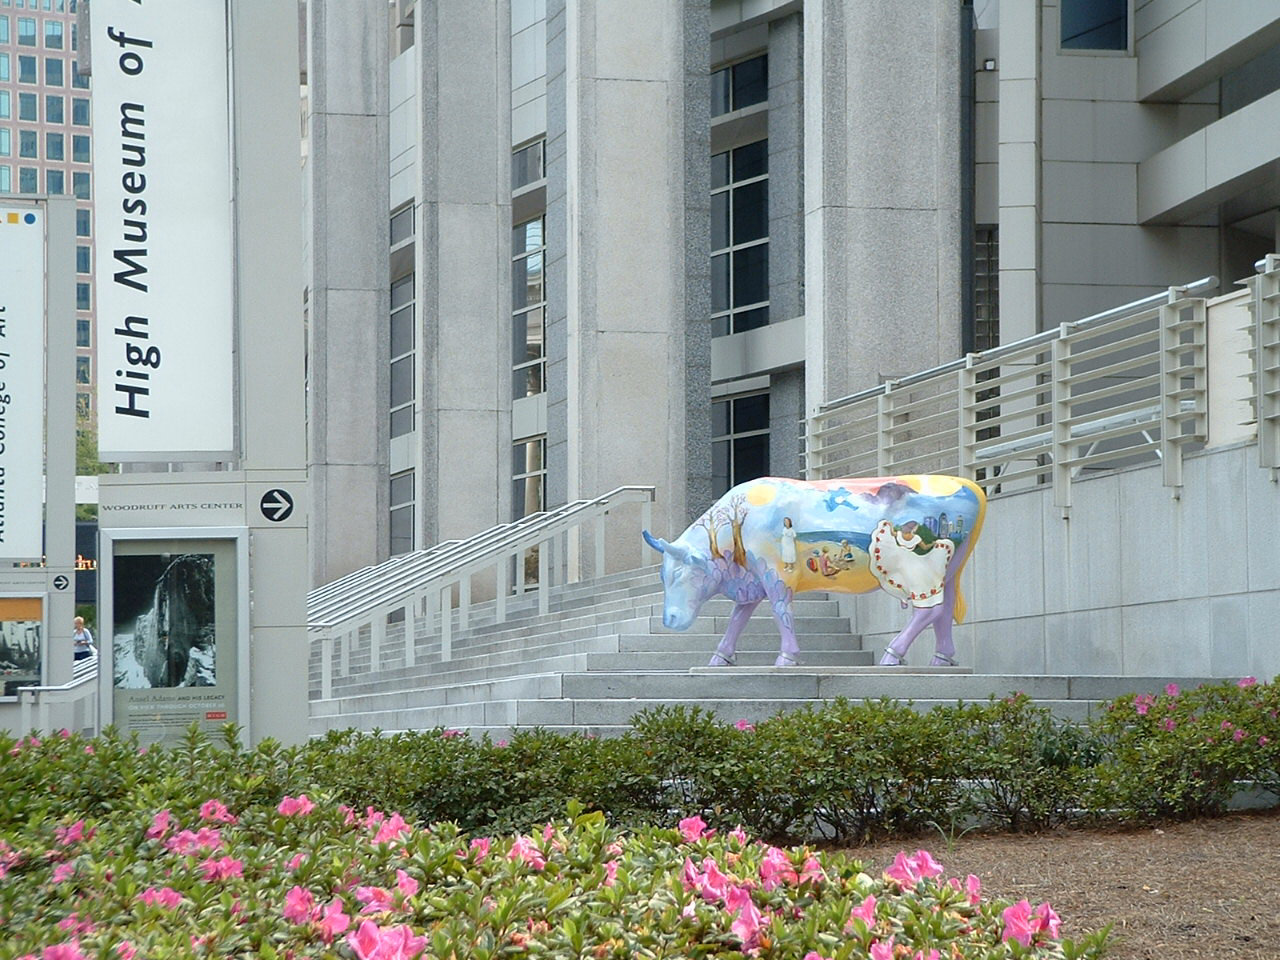 Monika Ruiz's Matilda sculpture at High Museum of Art Atlanta